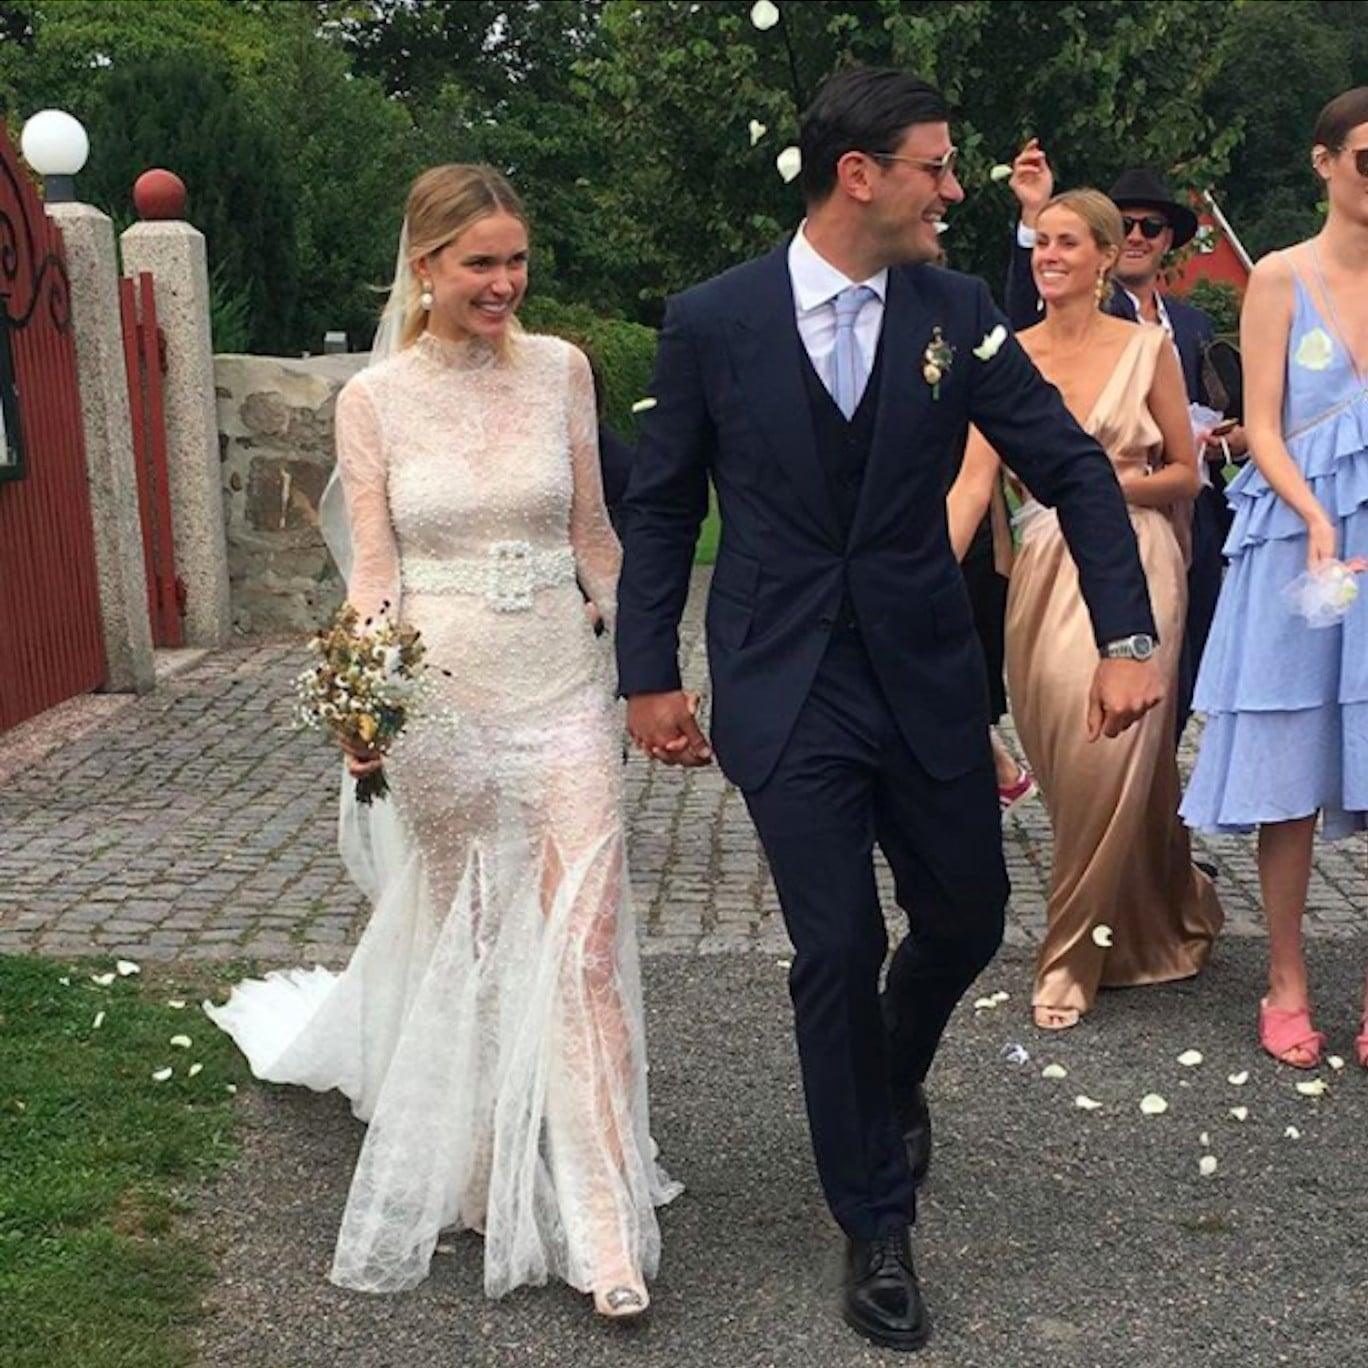 Pernille Teisbaek Vera Wang Wedding Dress | POPSUGAR Fashion